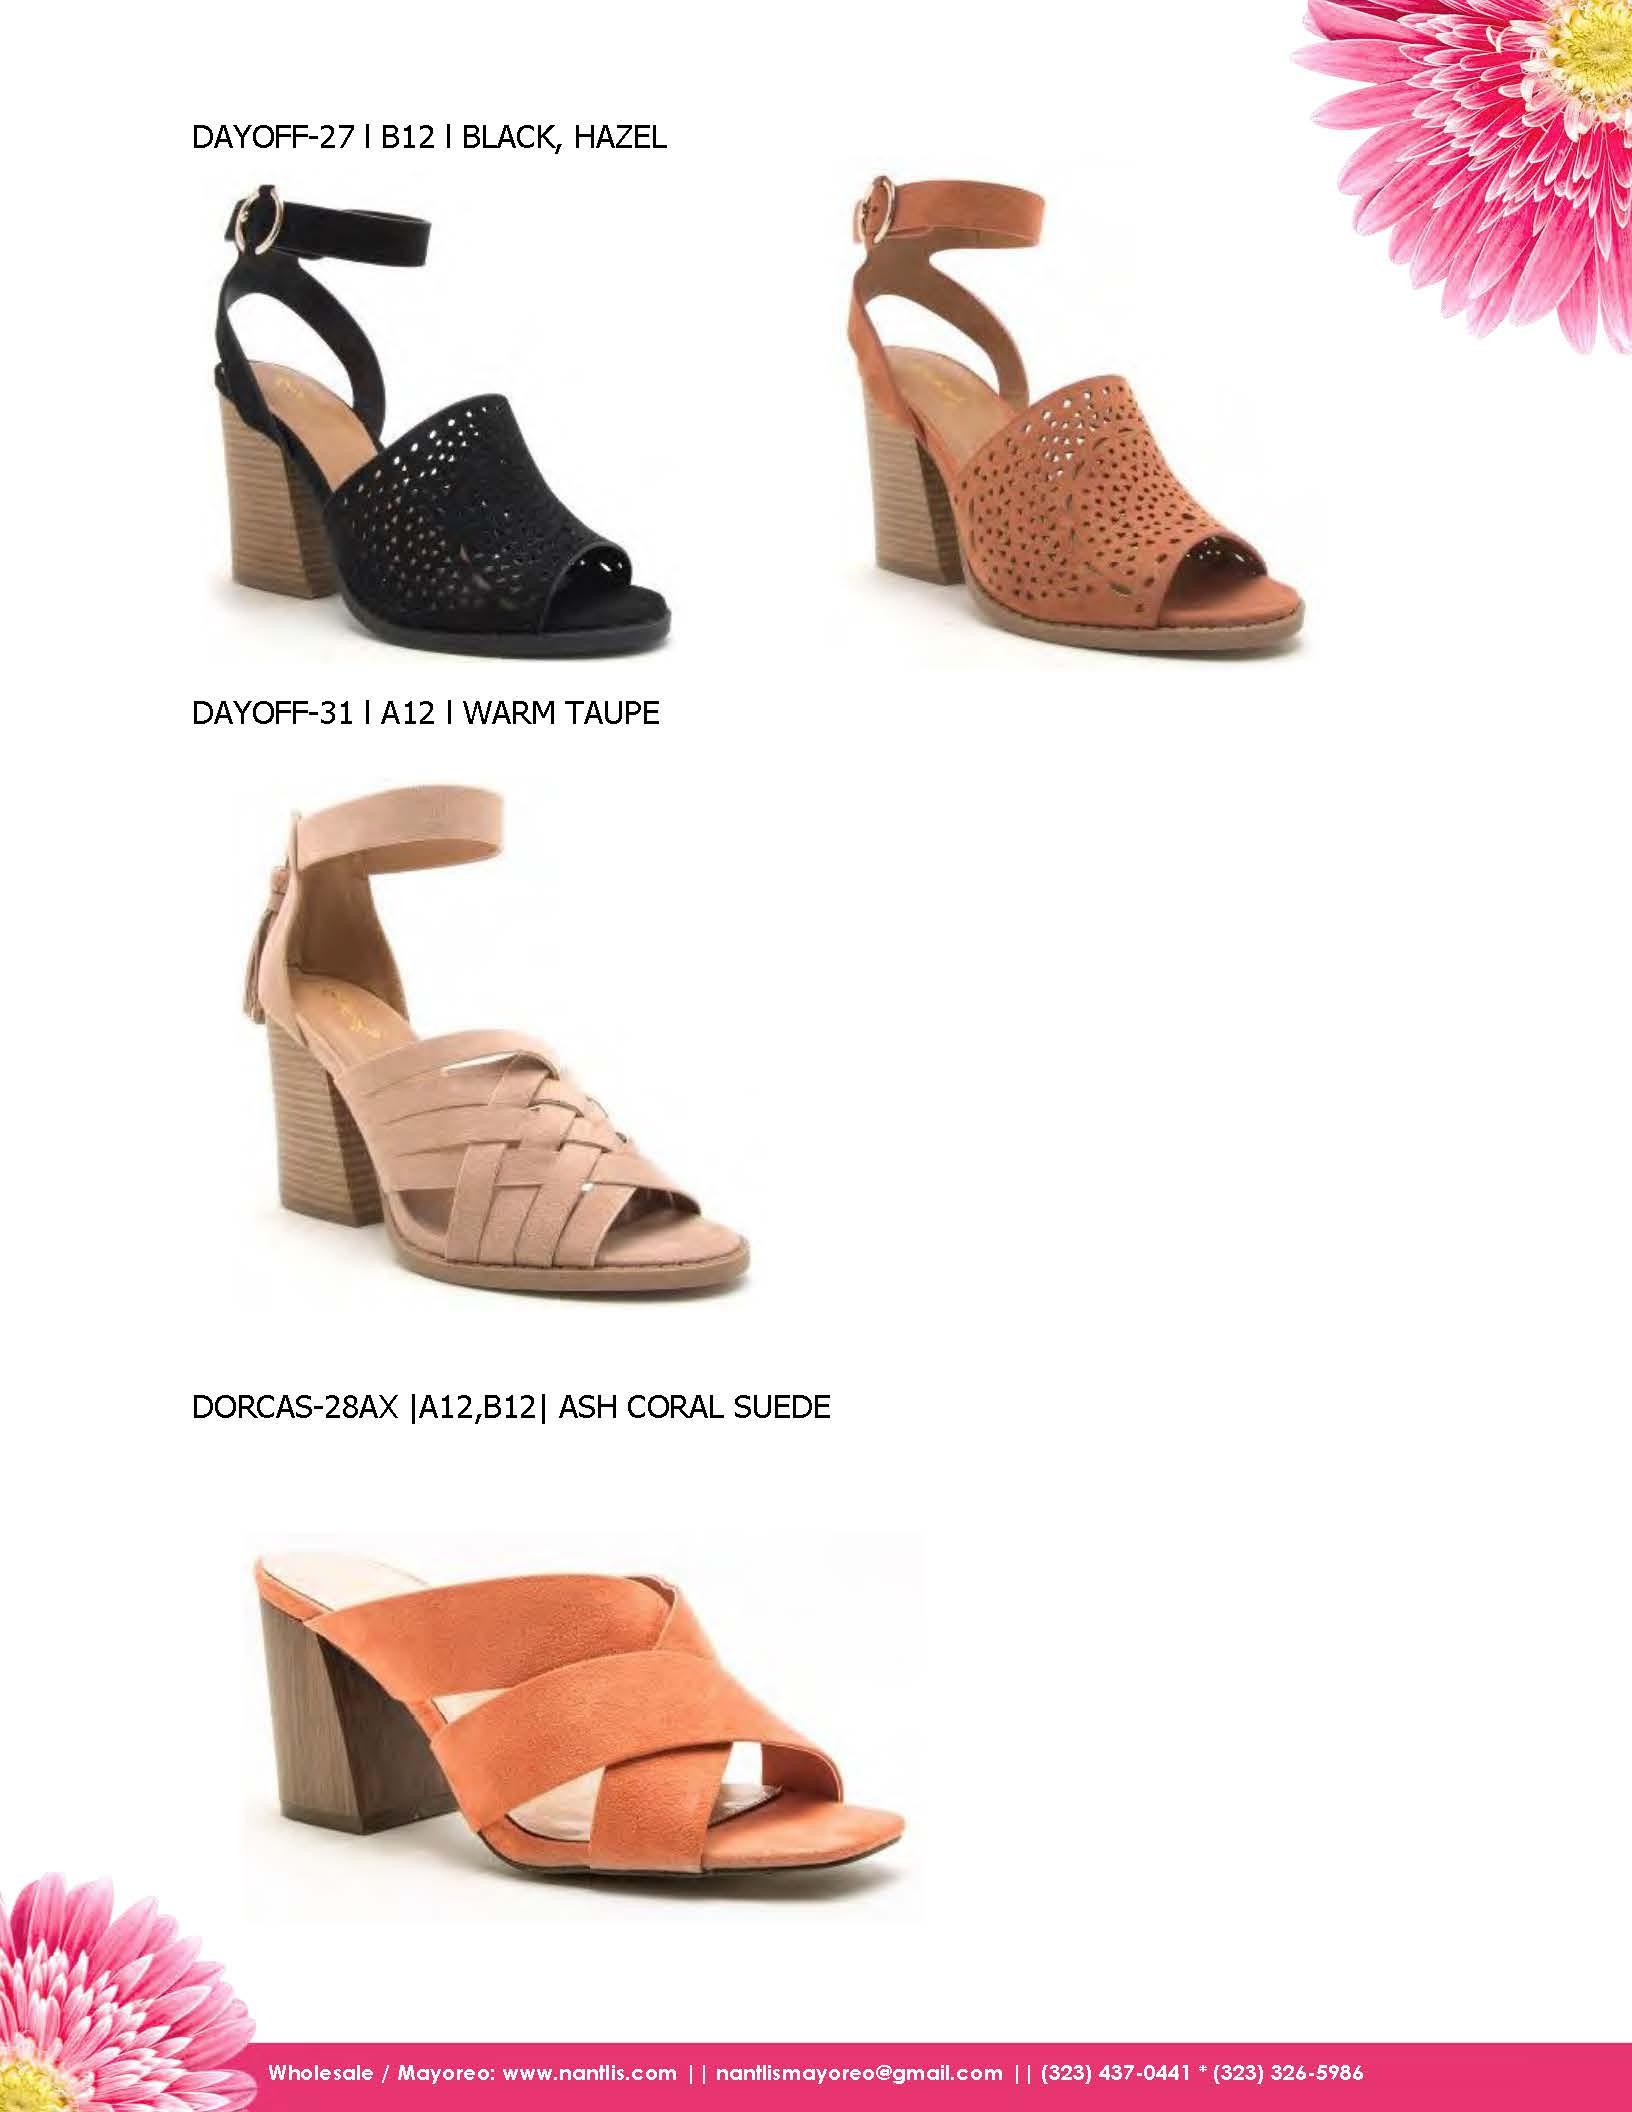 Nantlis Vol QU43 Zapatos para mujer mayoreo Wholesale shoes for women_Page_18